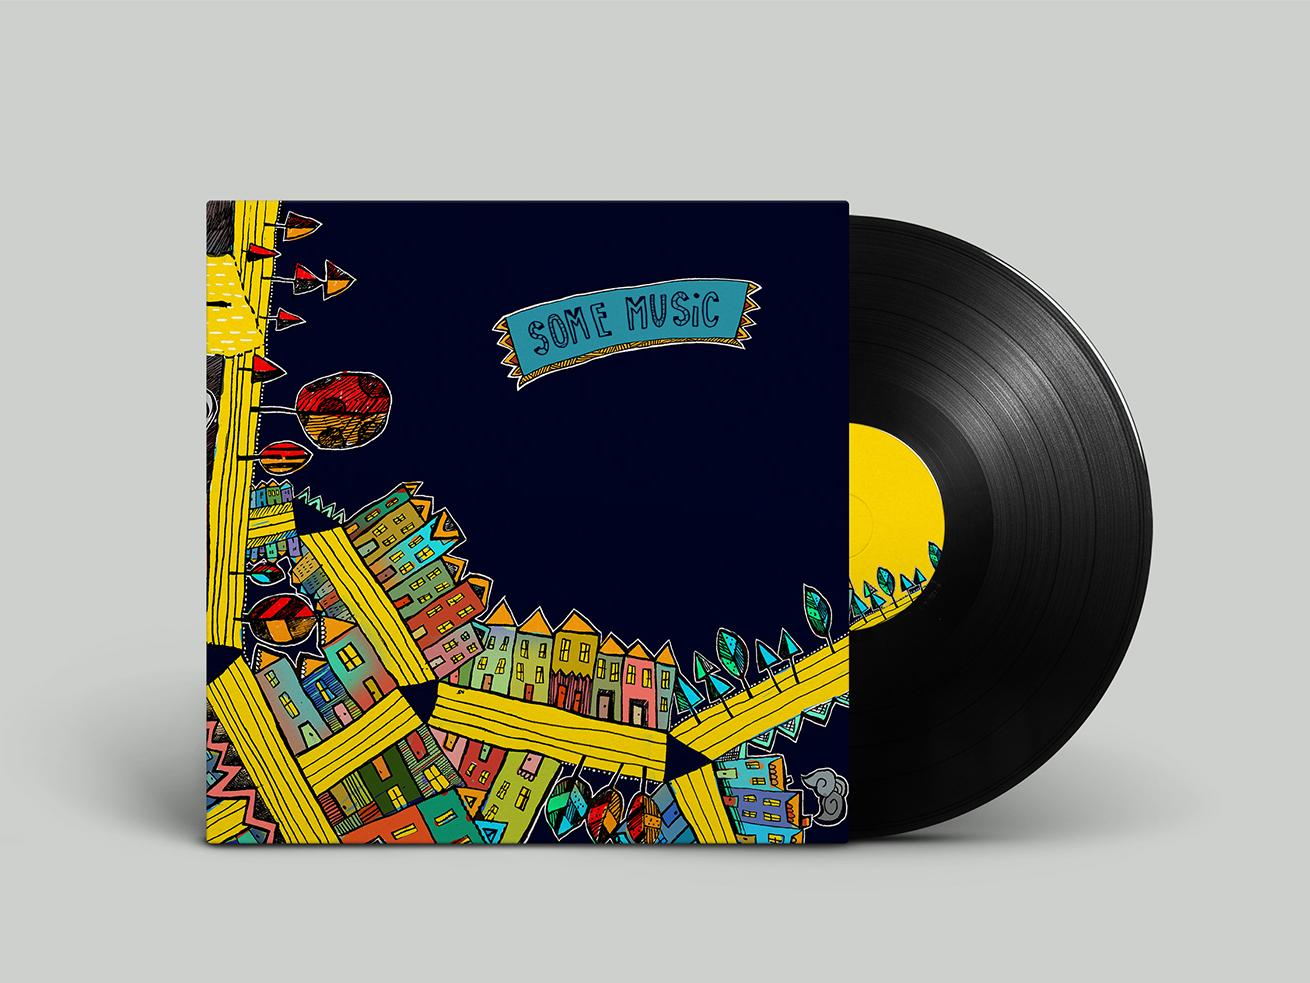 Vinyl cover cover cover design multicolor music city illustration cover art vinyl